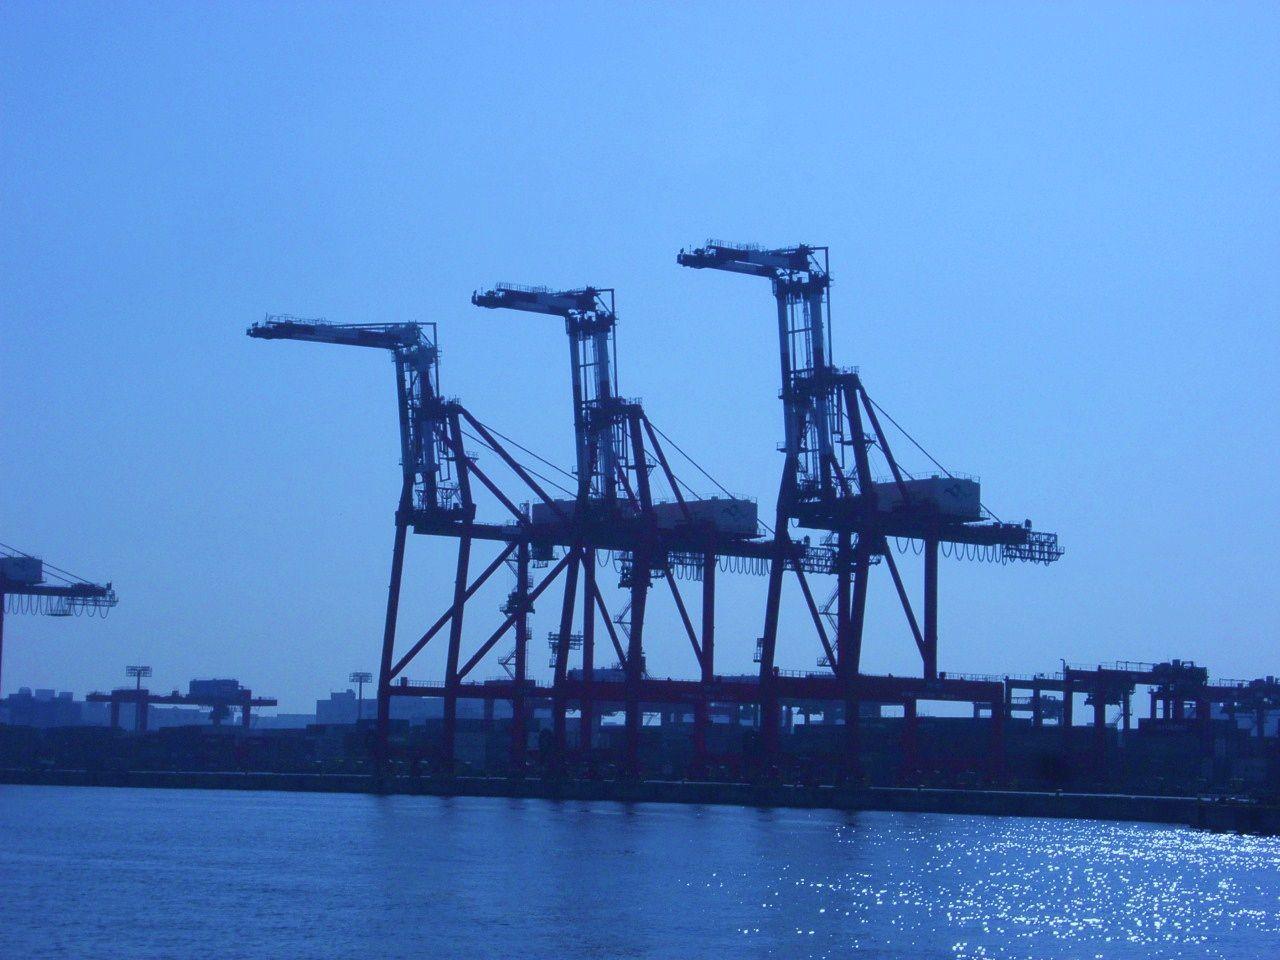 Giraffes standing on wharf